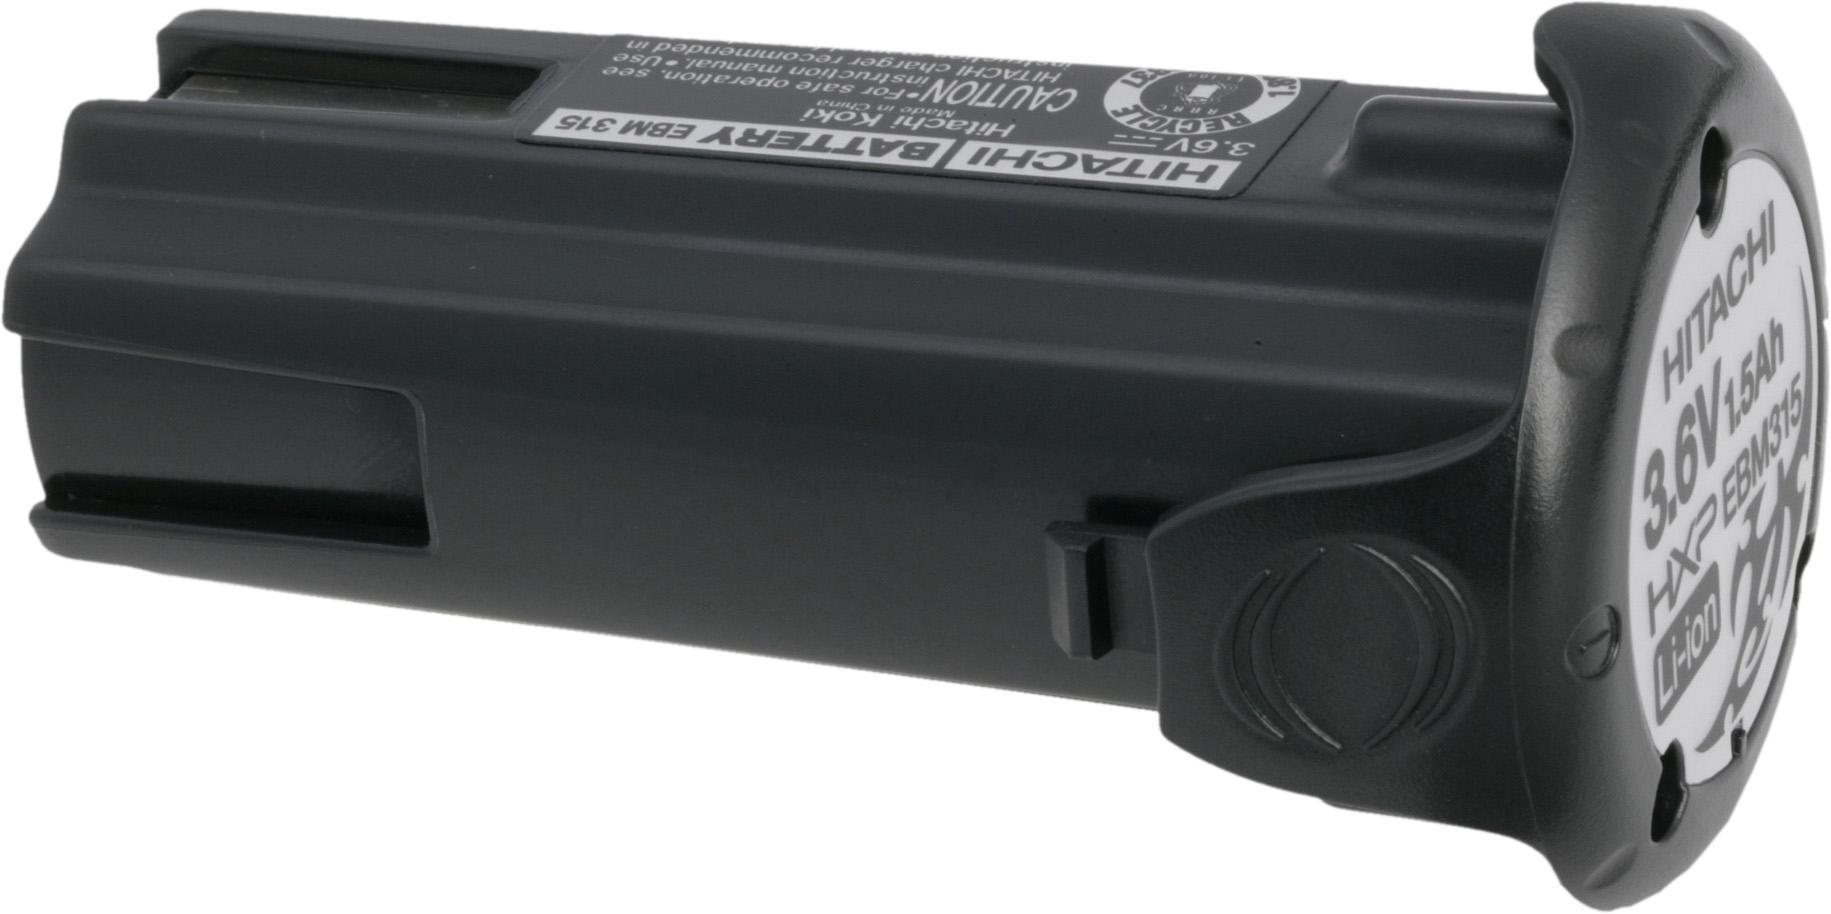 Аккумулятор Hitachi Ebm315 аккумулятор hitachi 323226